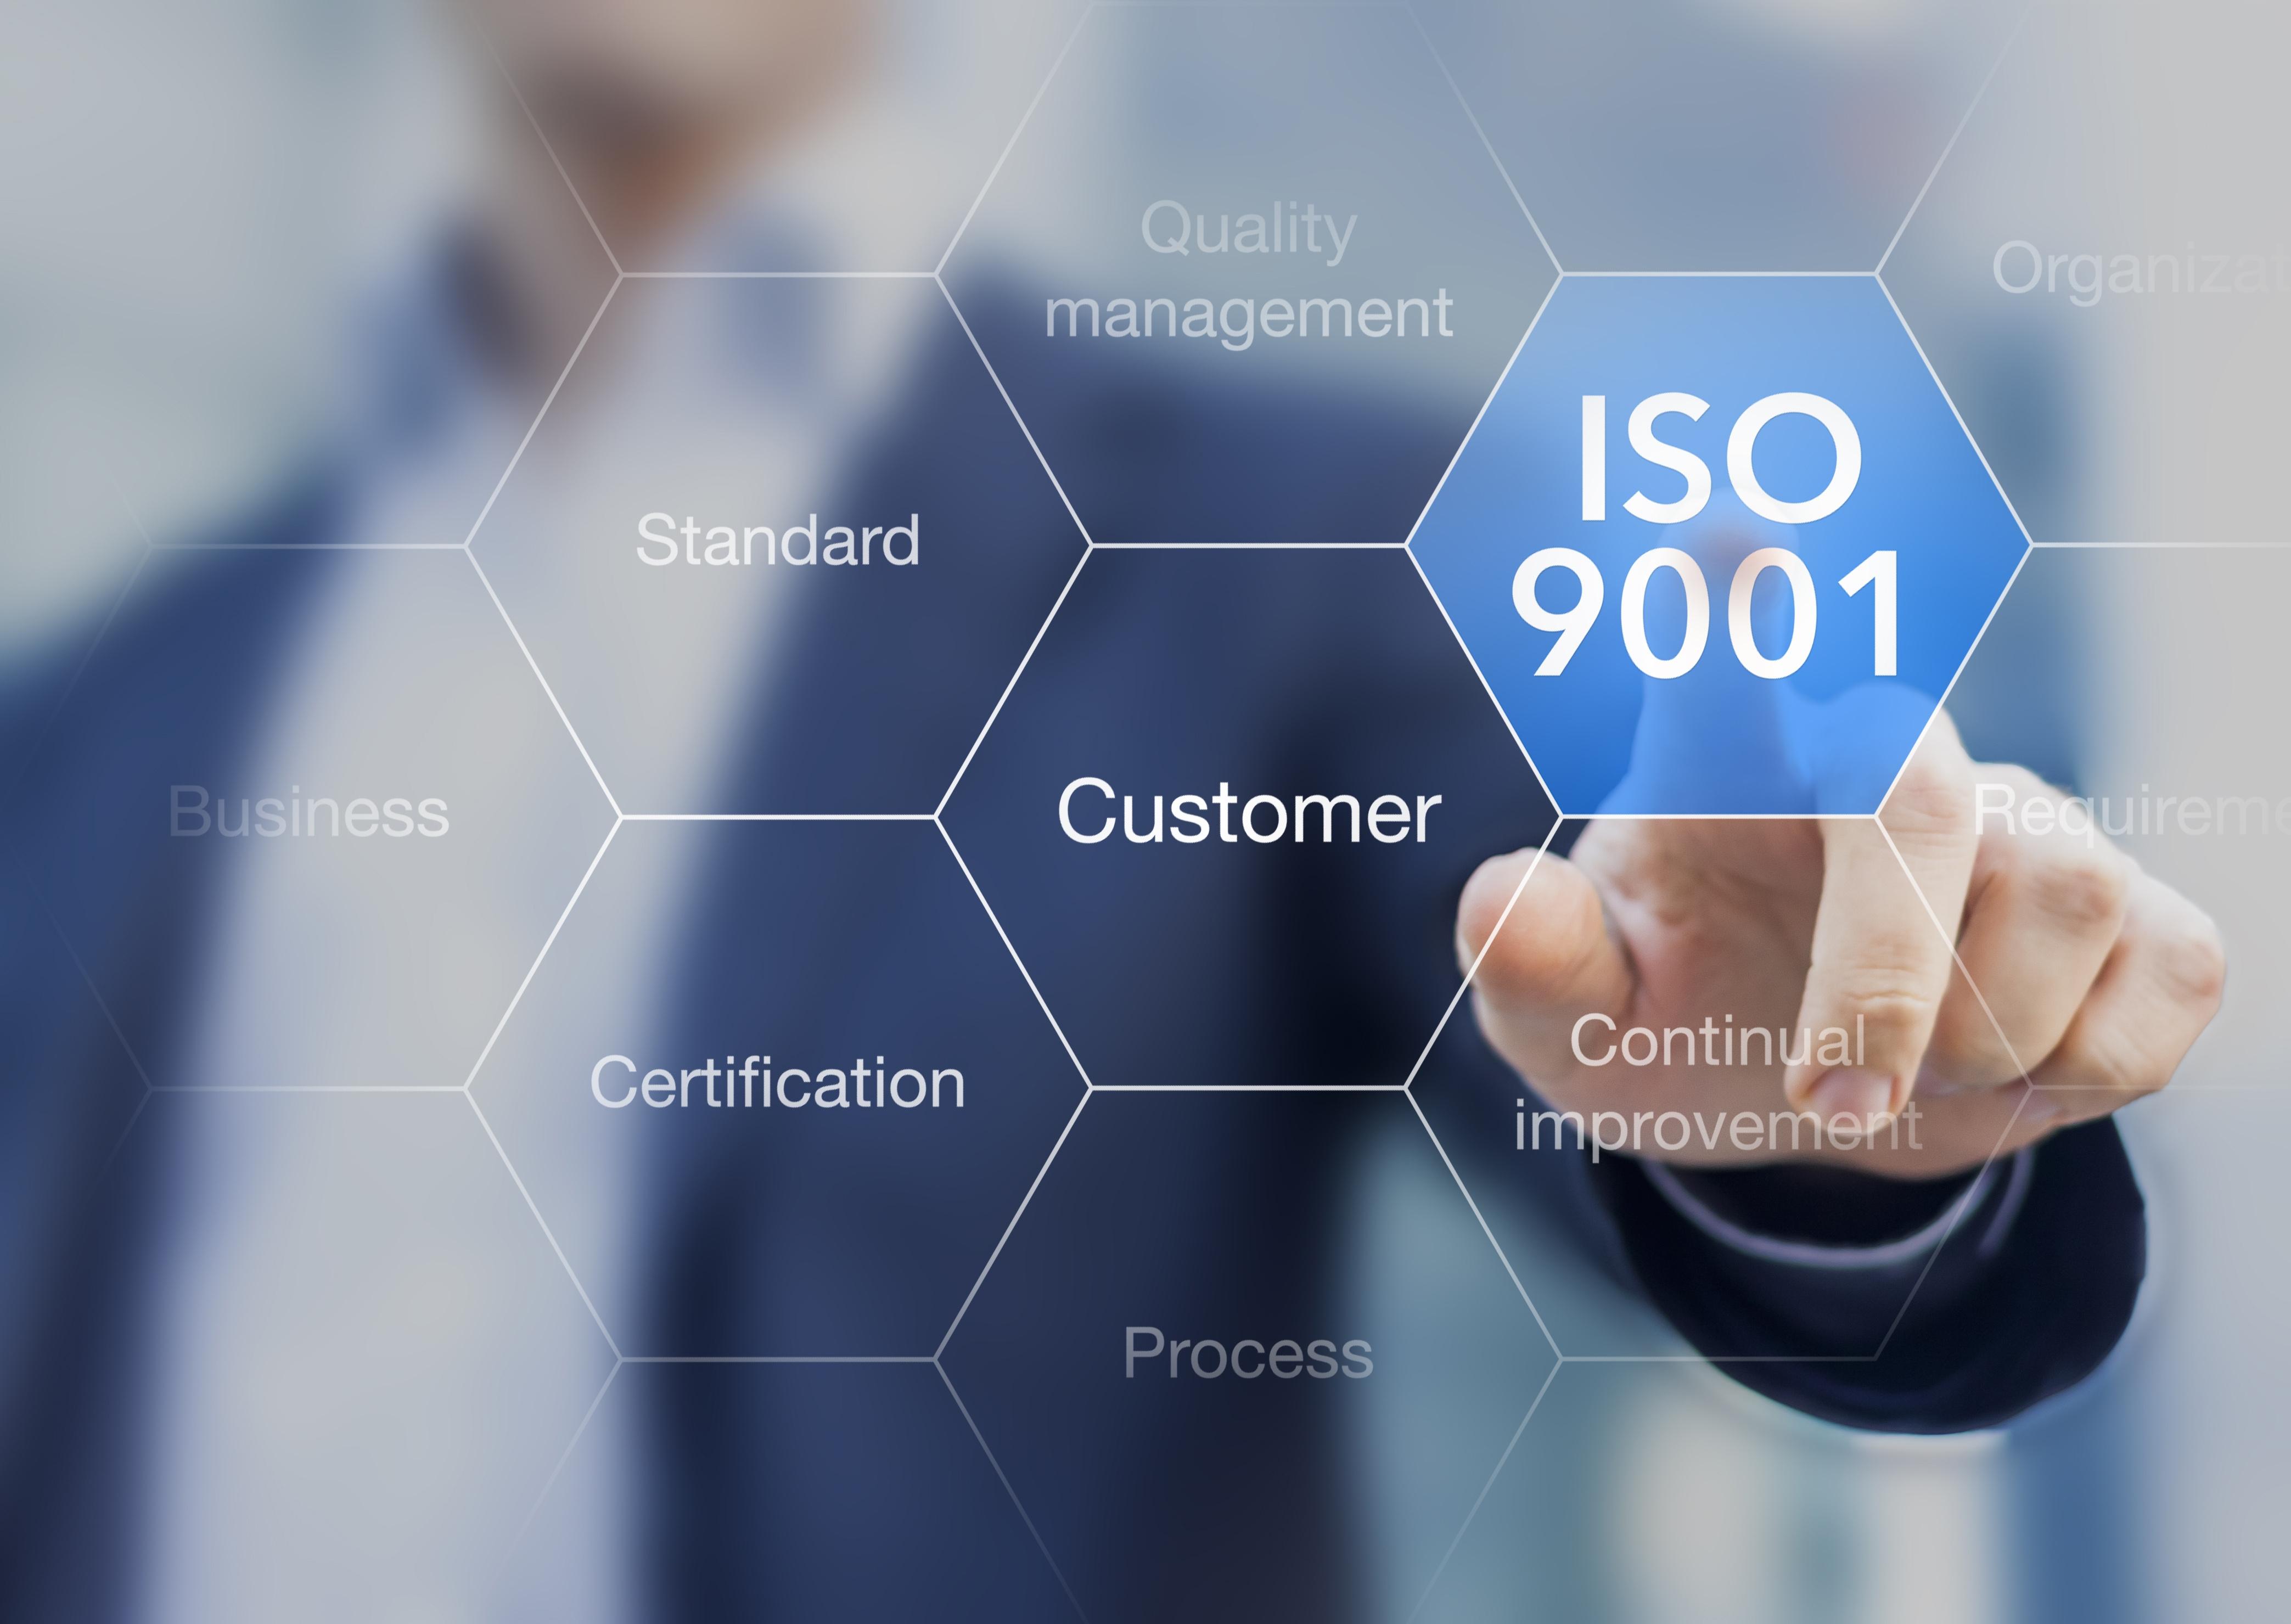 Maripak ISO 9001 Standards